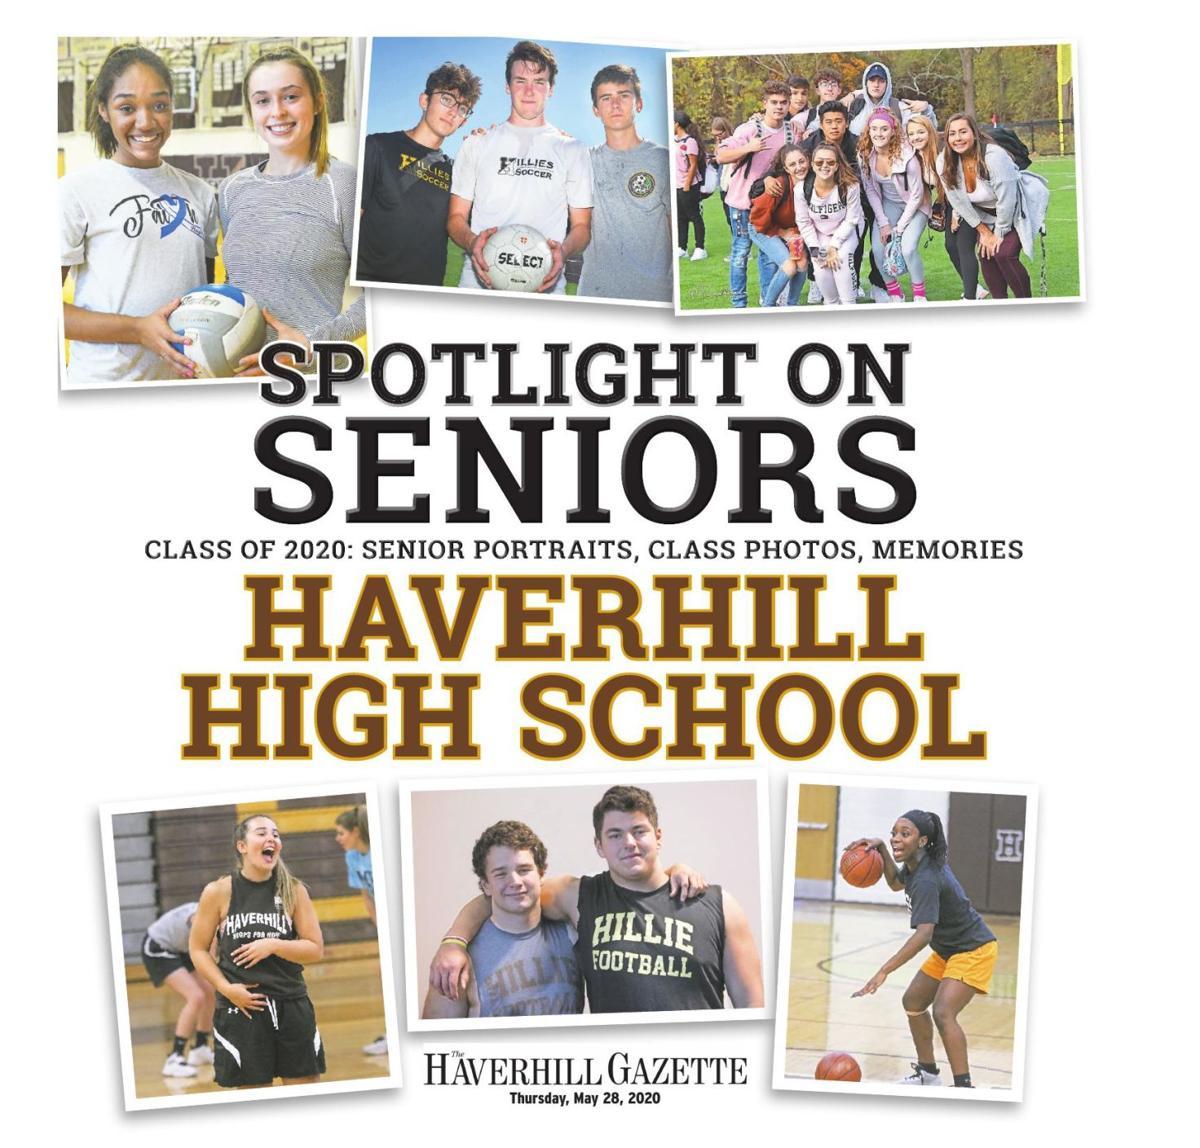 Spotlight on Seniors: Haverhill High